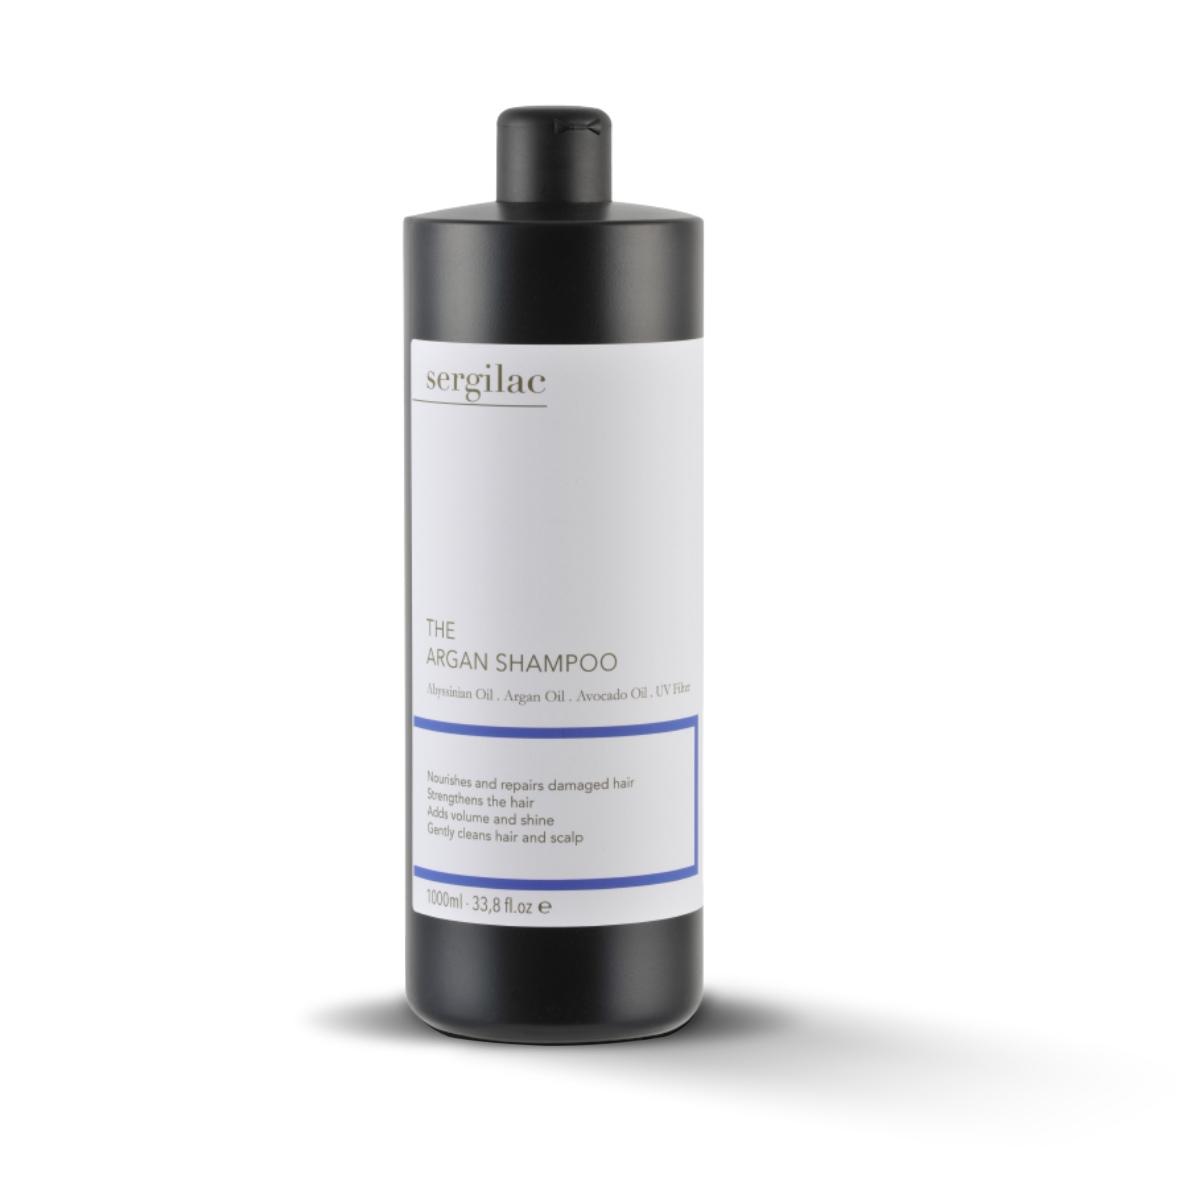 The Argan Shampoo - Sergilac 1 Litro